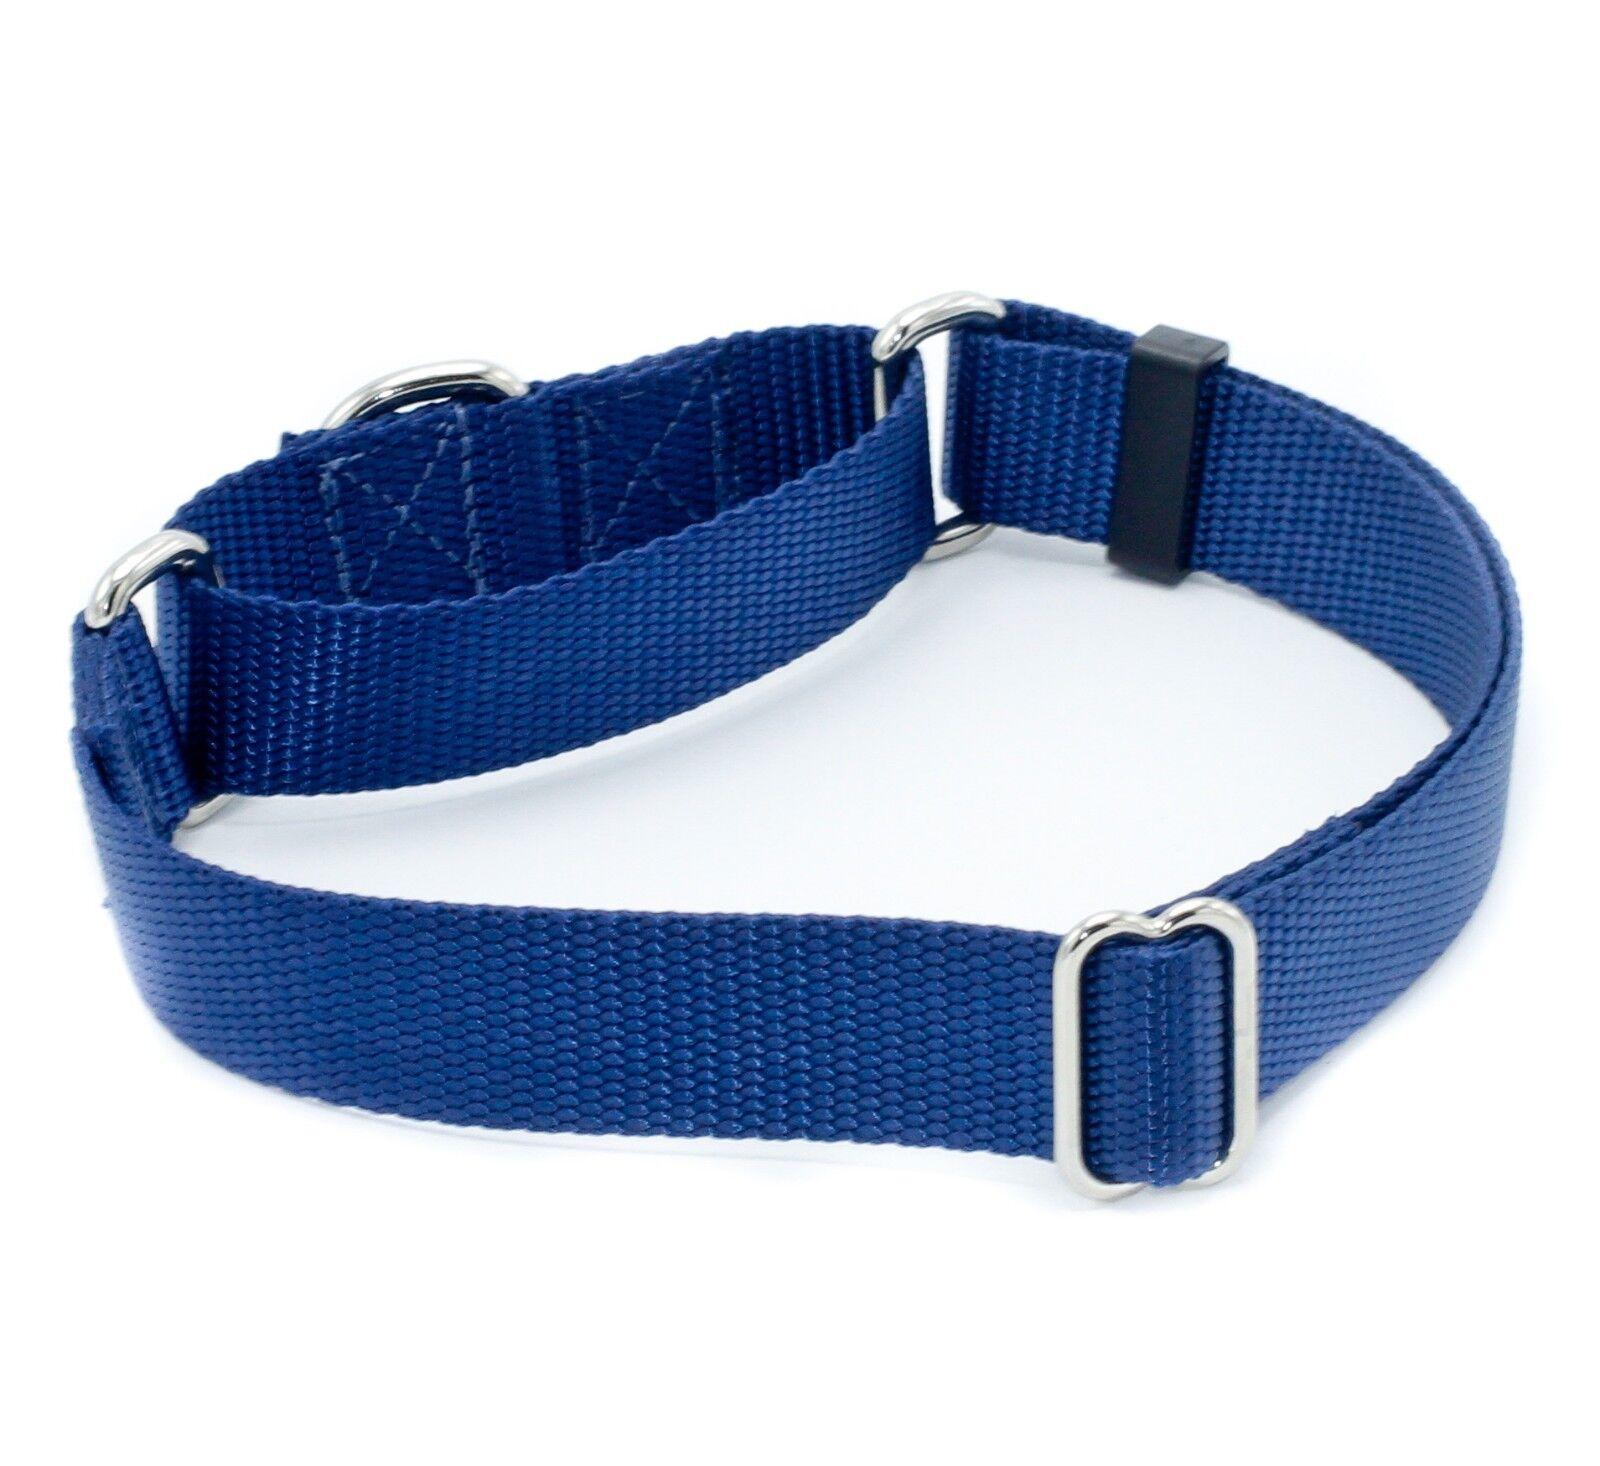 "3/4 Inch Martingale No Slip Dog Collars 3/4"" Nylon Dog Colla"